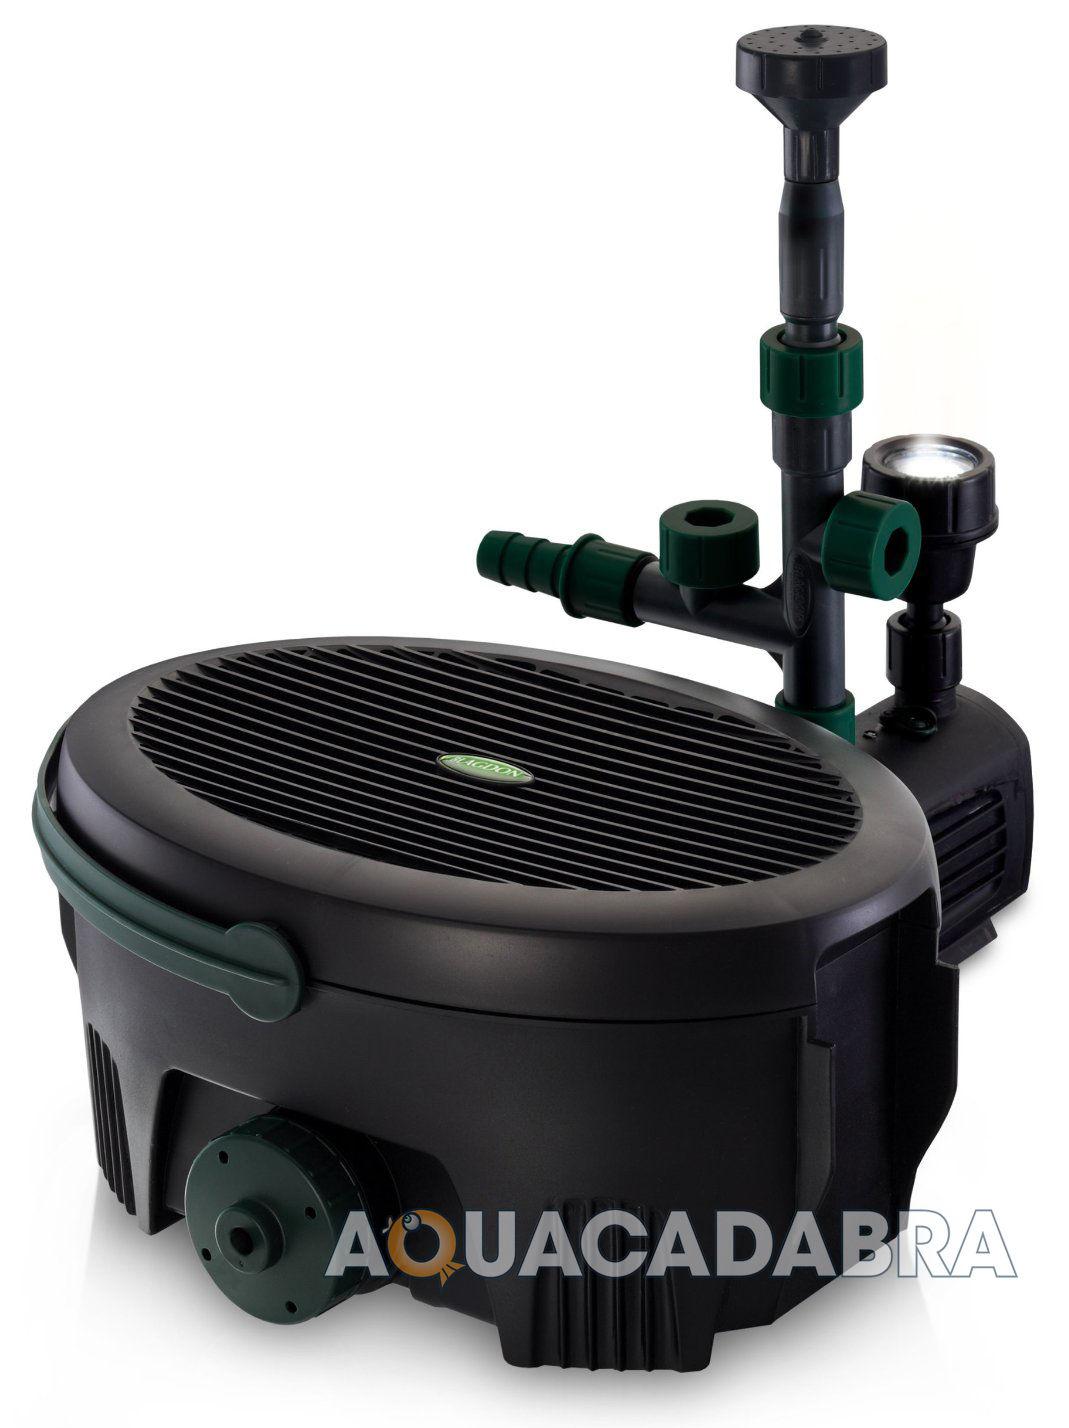 Blagdon Inpond Filter Uvc Pond Submersible Pump Led Light